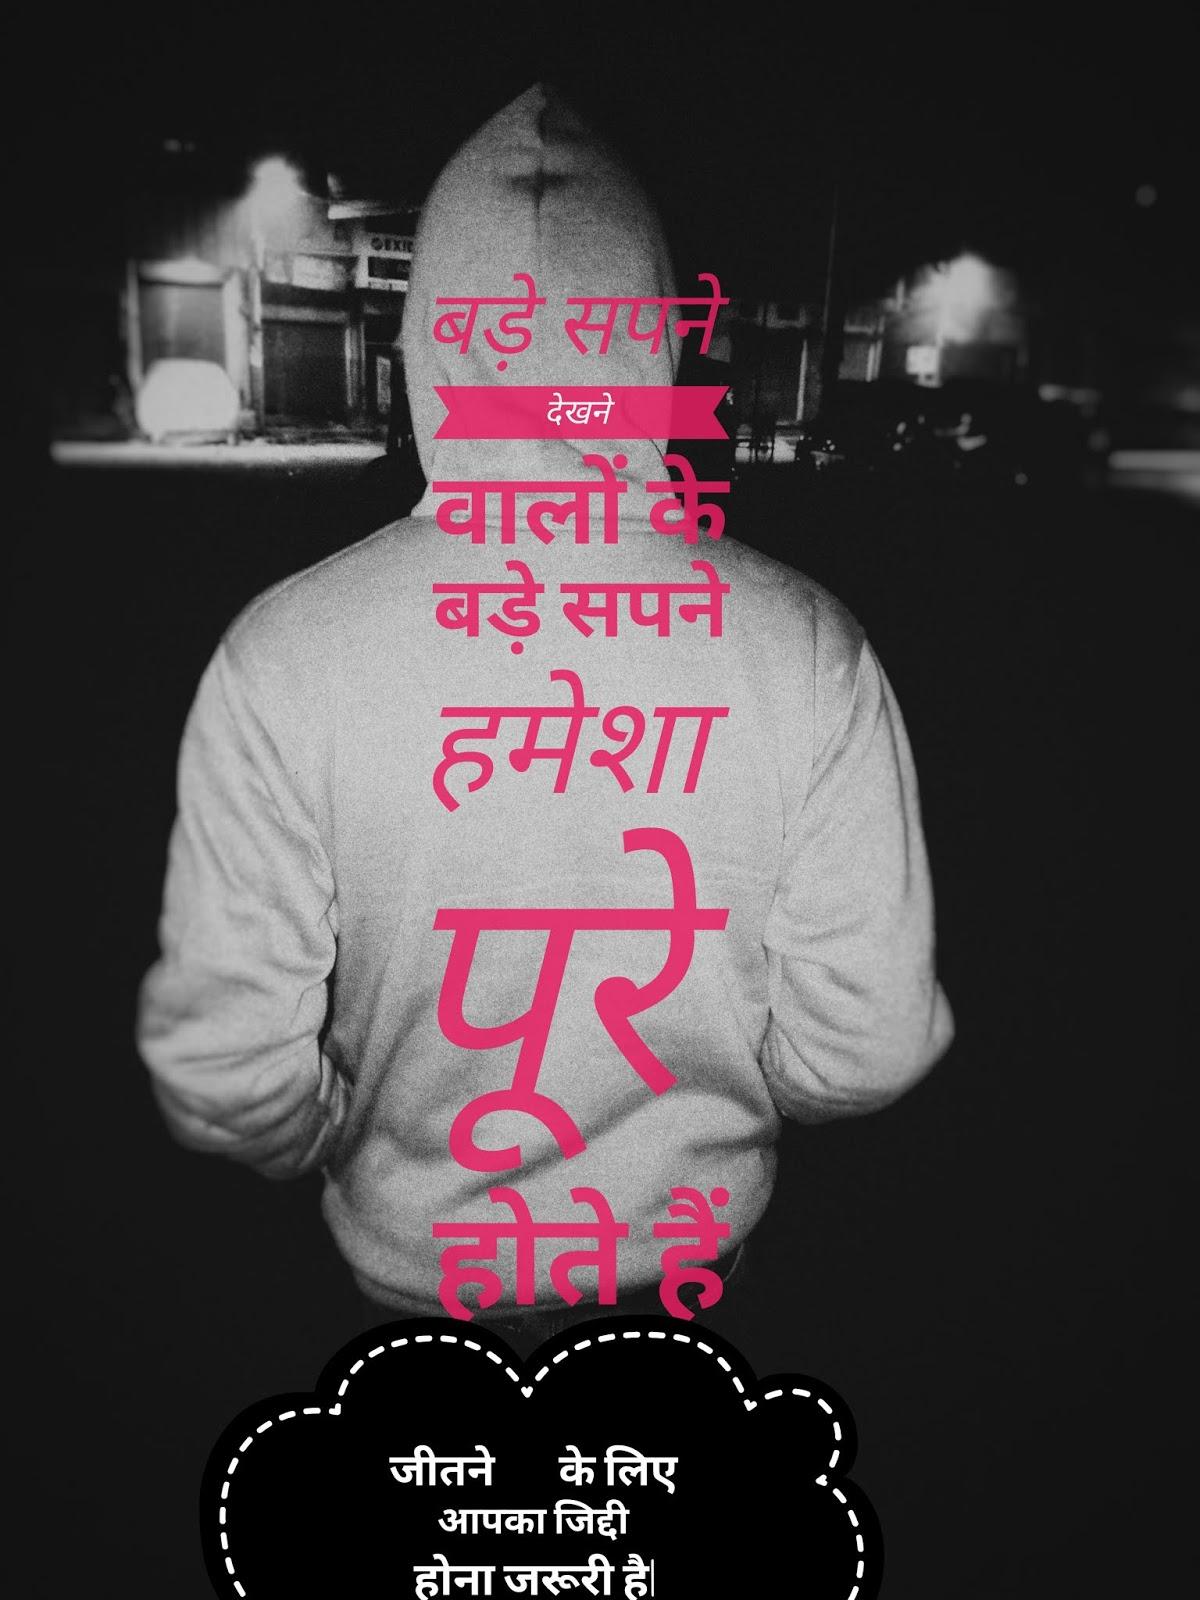 Attitude Quotes In Hindi : attitude, quotes, hindi, Hindi, Attitude, Status, Motivational, Quotes